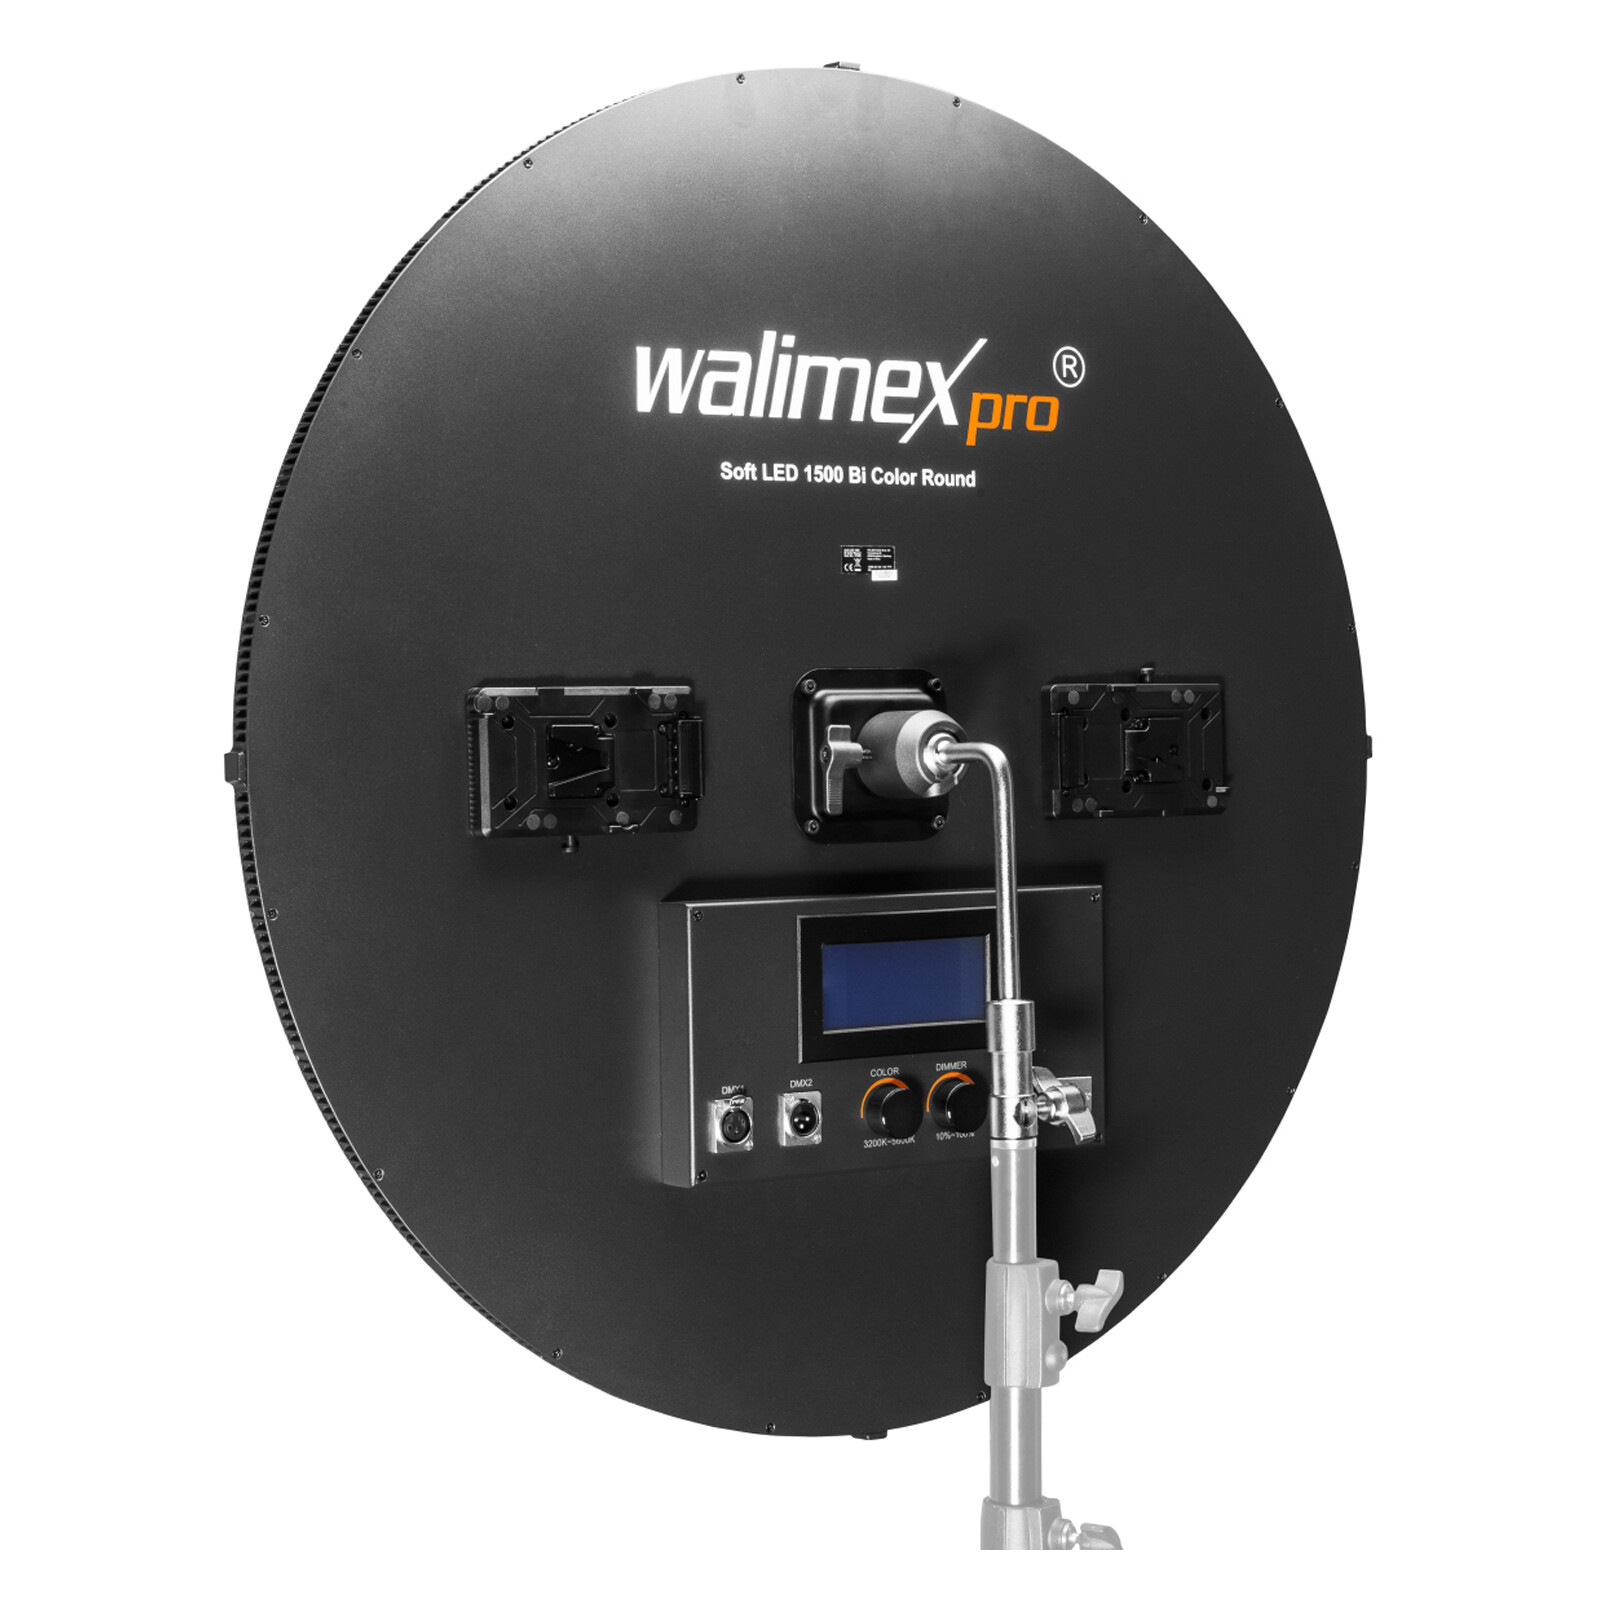 walimex pro Soft LED 1500 Bi Color Round